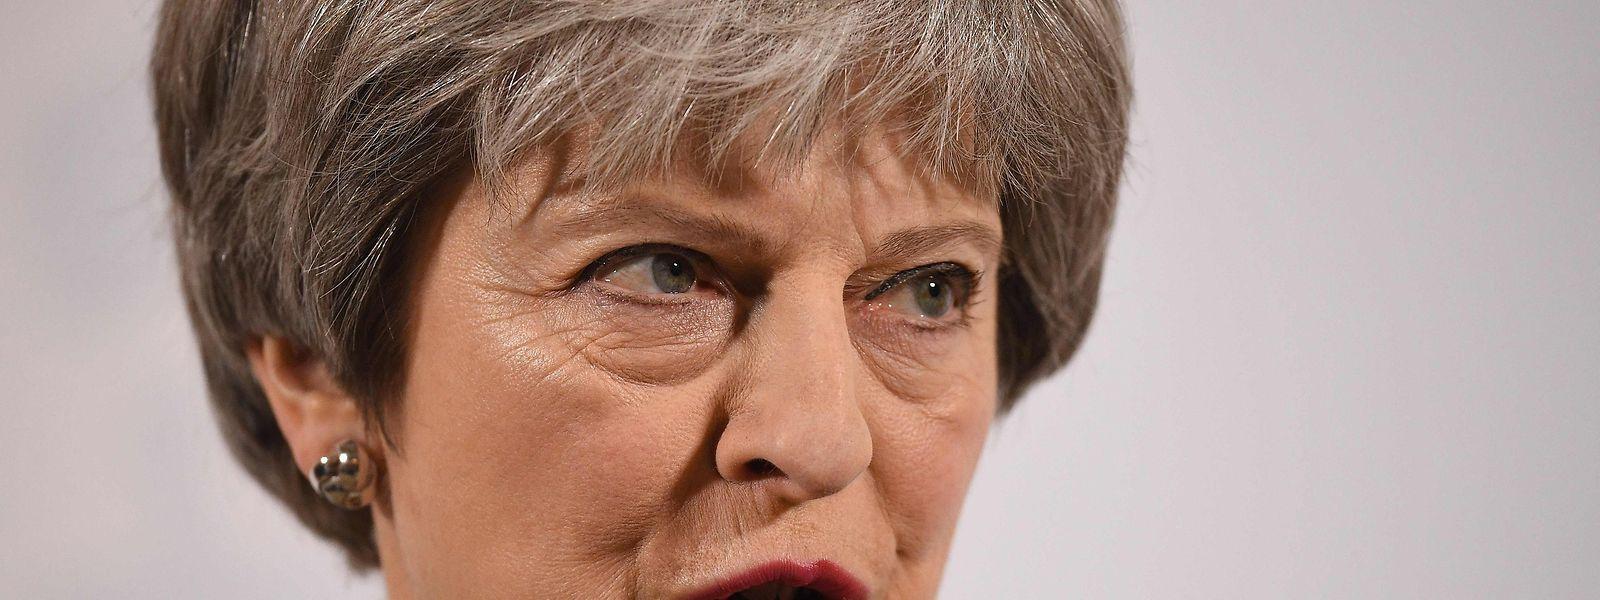 Theresa May bleibt in der Brexit-Frage hart.